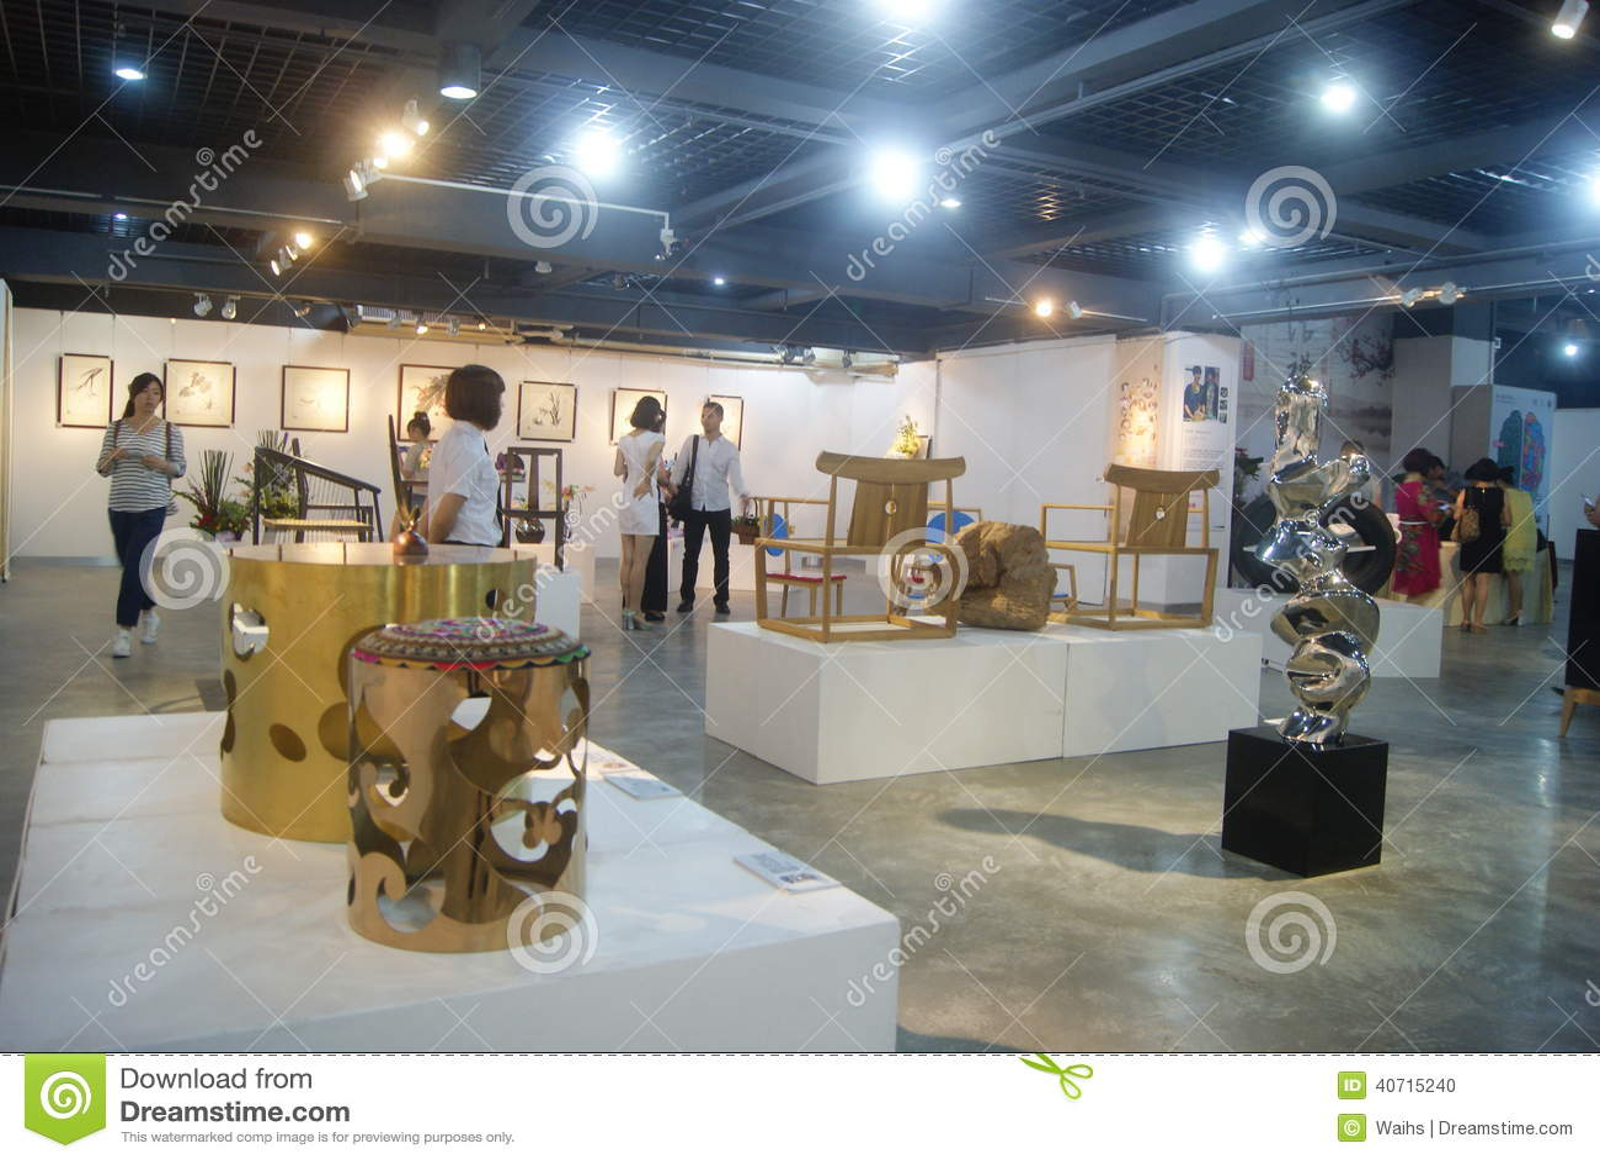 Creative Exhibition Design Ideas